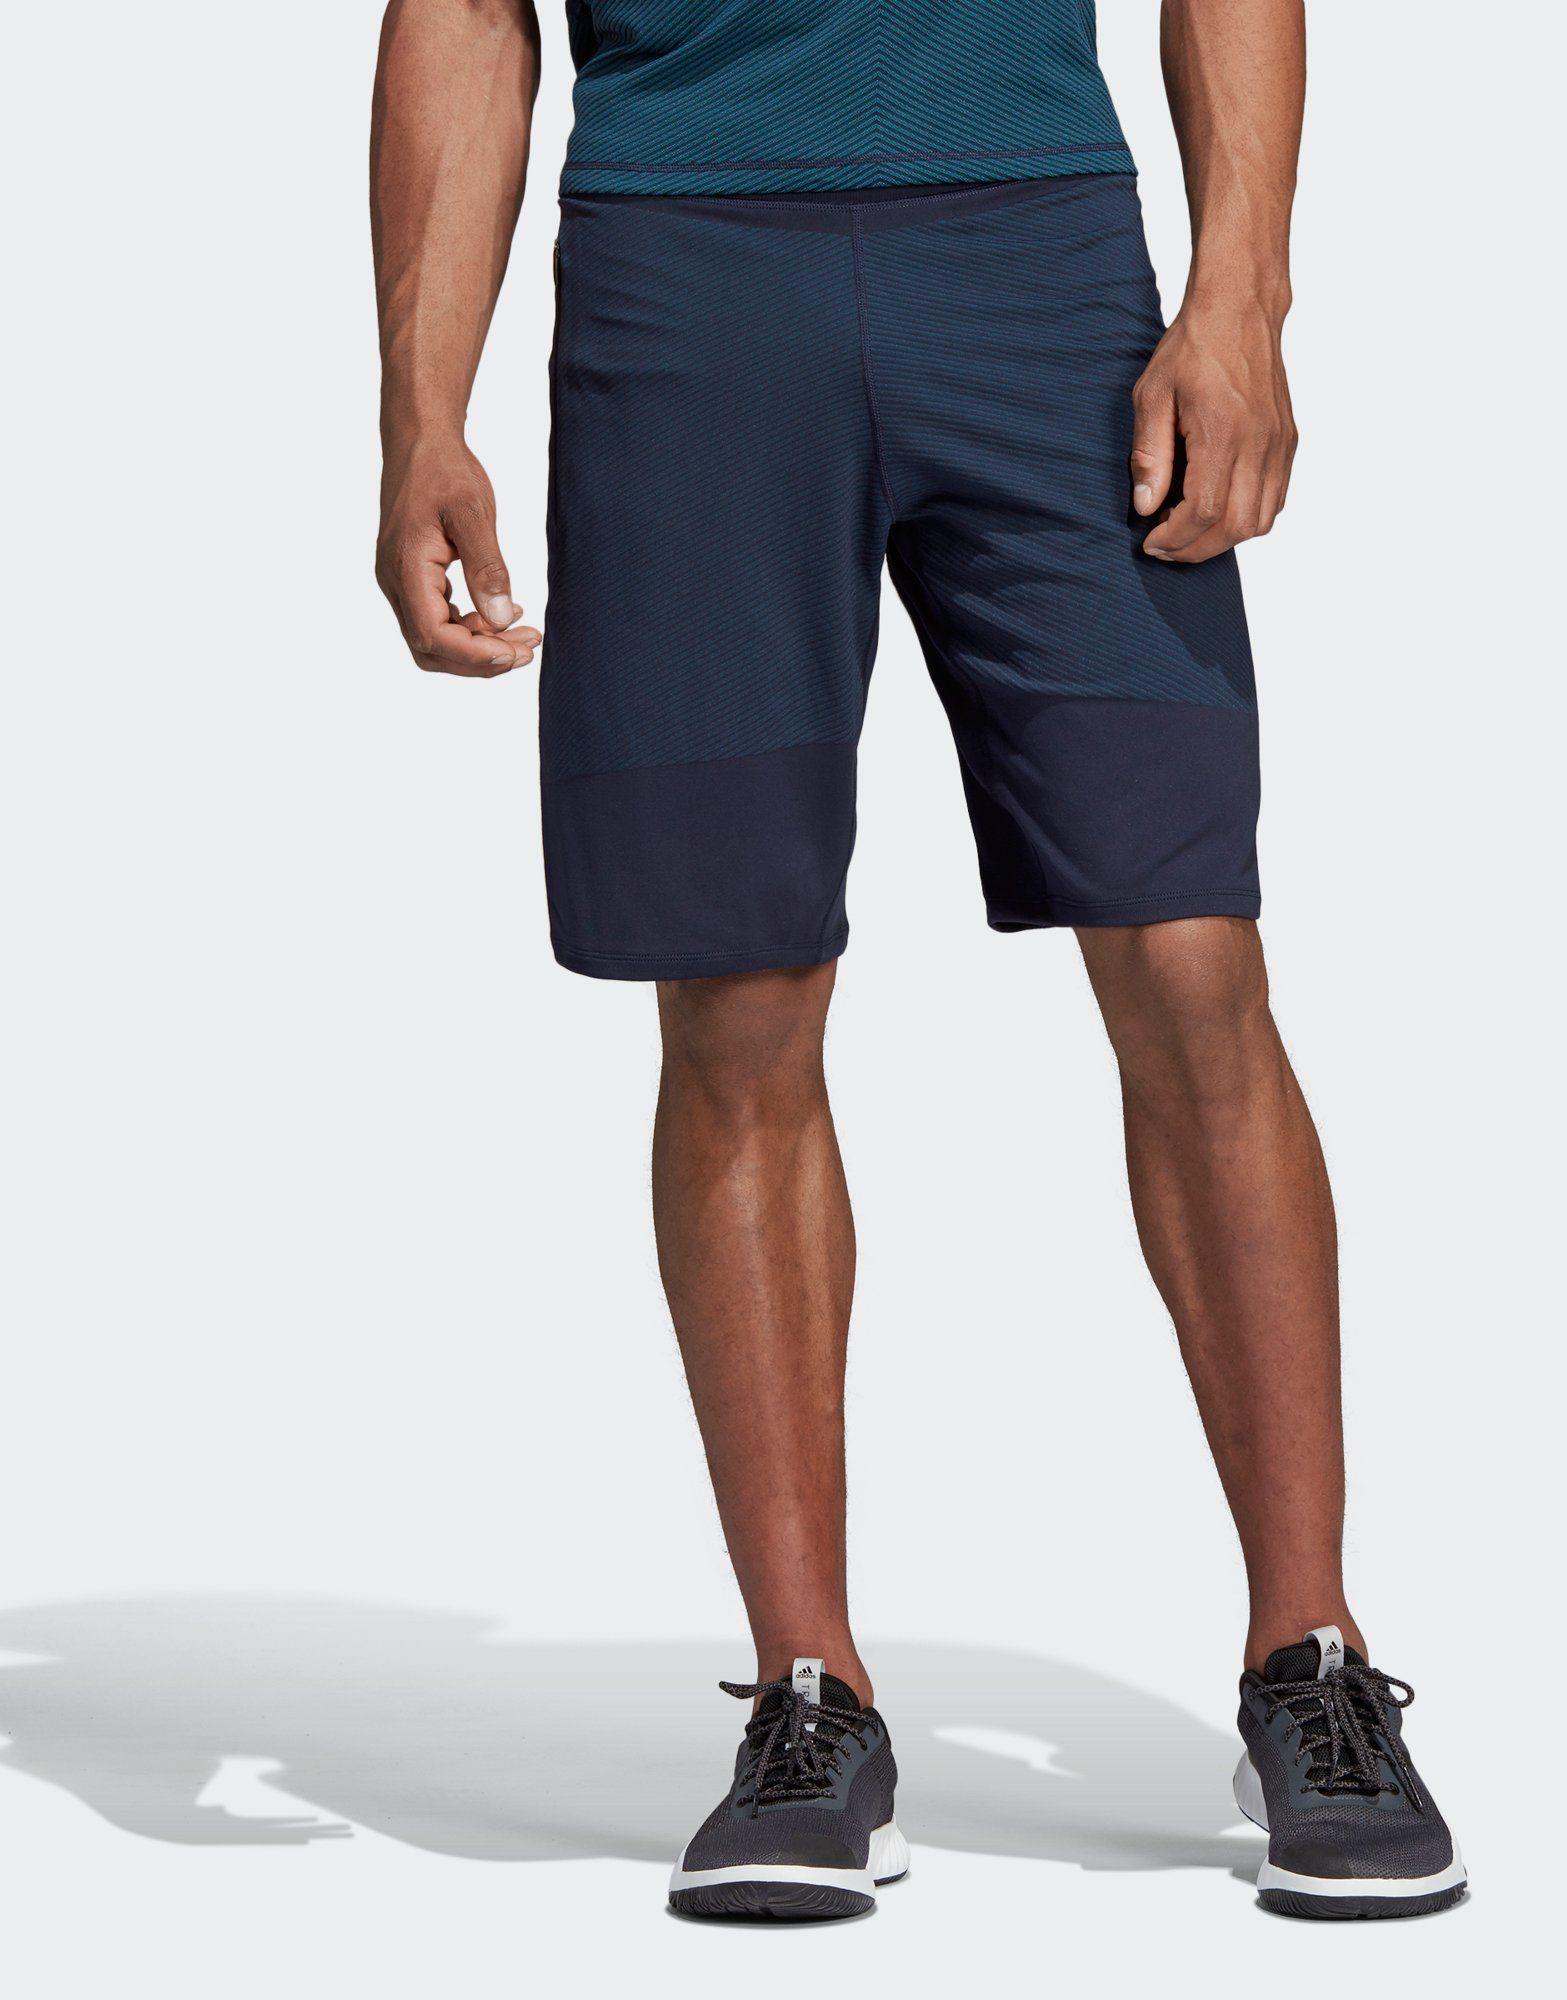 promo code 0be05 63822 ADIDAS 4KRFT Primeknit Parley Shorts  JD Sports